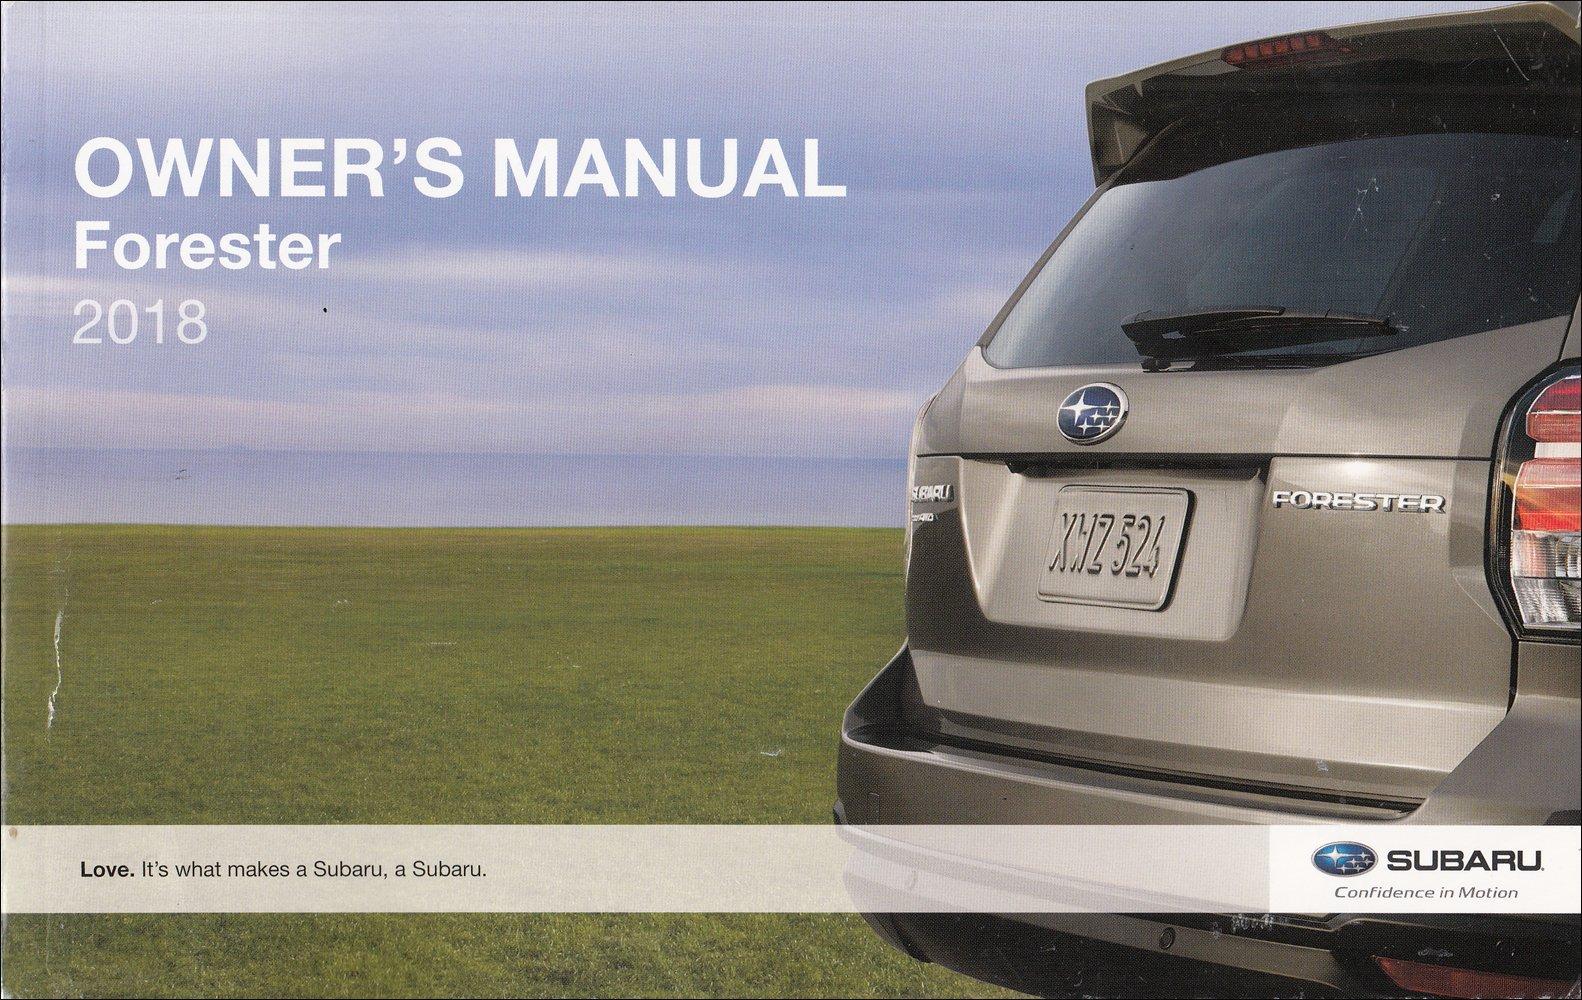 2018 Subaru Forester Owner S Manual Original Subaru Amazon Com